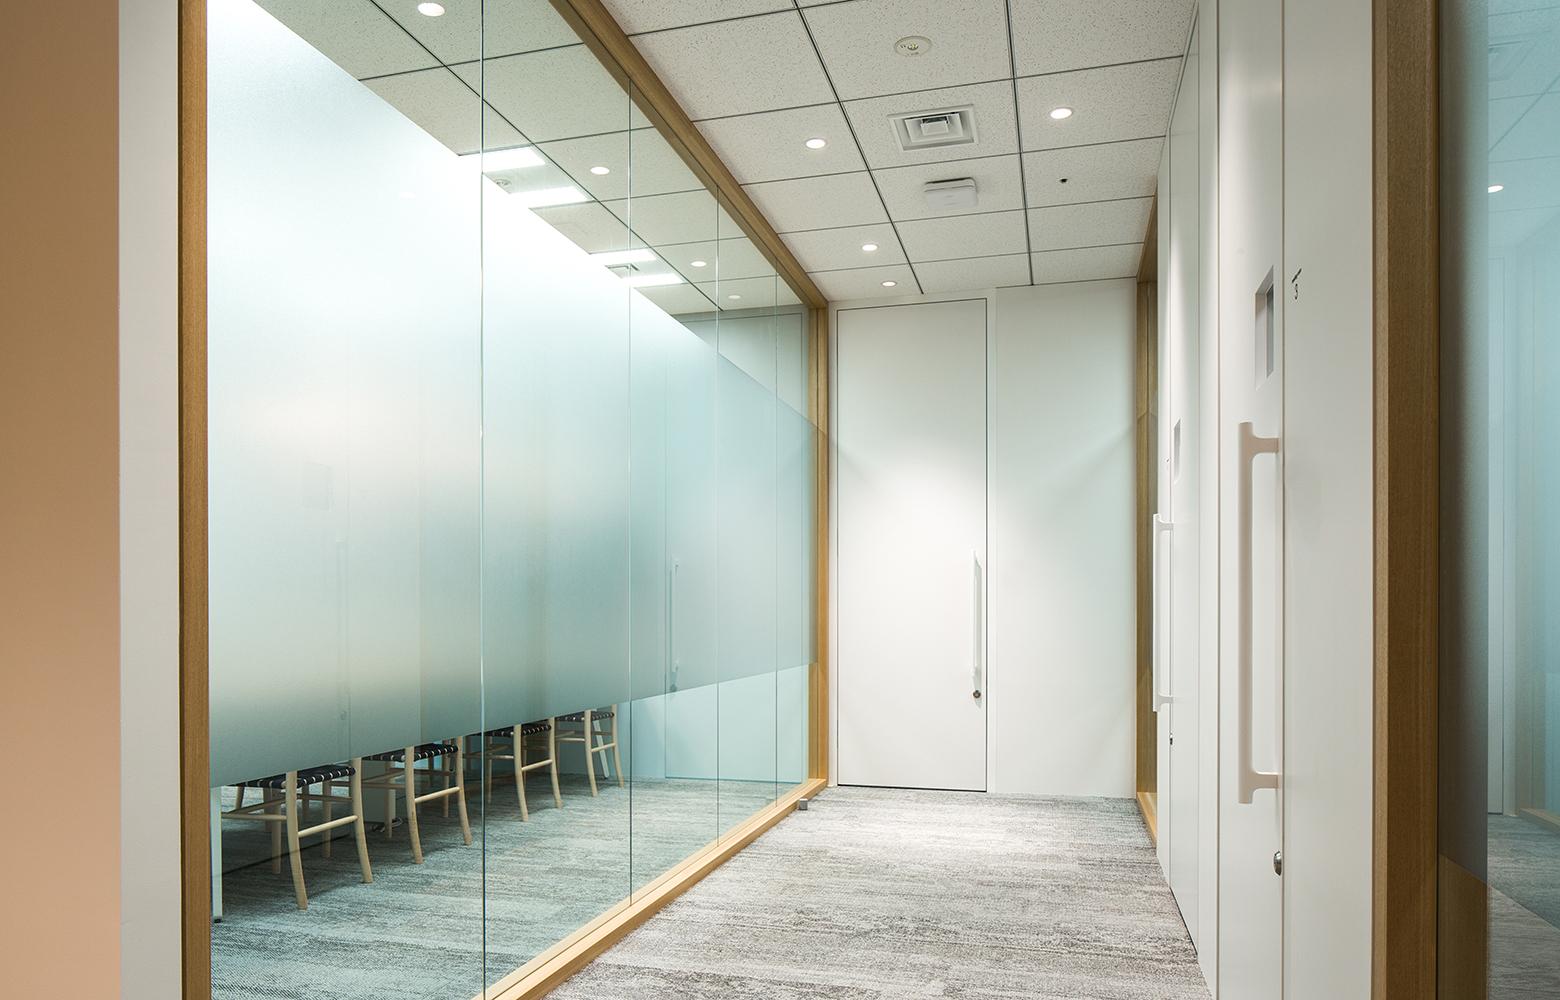 KLab株式会社 Roppongi Office Corridor デザイン・レイアウト事例